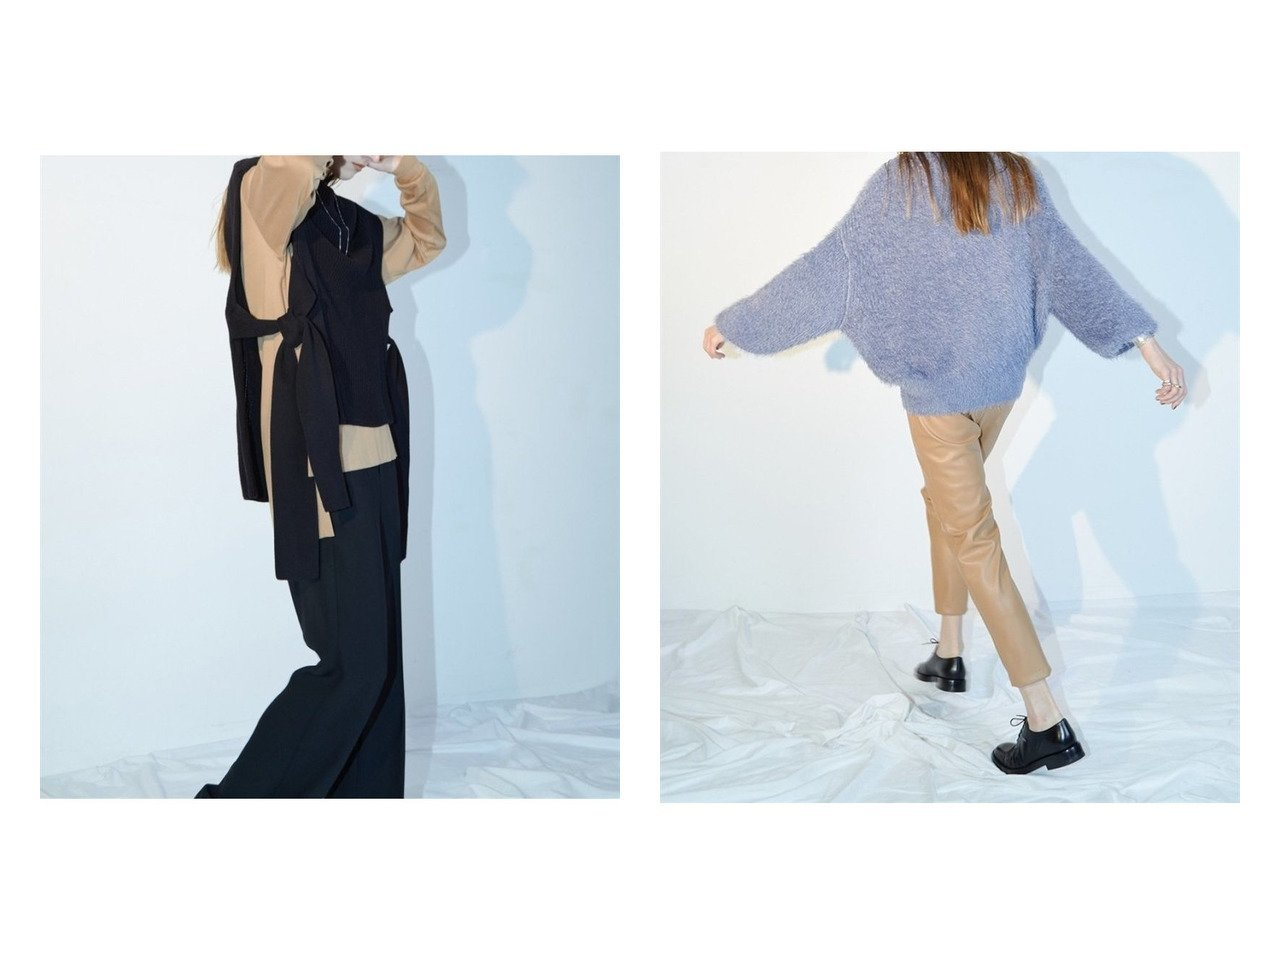 【styling/スタイリング】のイタリーフェザーヤーンプルオーバー&ノースリーブニットプルオーバー トップス・カットソーのおすすめ!人気、トレンド・レディースファッションの通販  おすすめで人気の流行・トレンド、ファッションの通販商品 メンズファッション・キッズファッション・インテリア・家具・レディースファッション・服の通販 founy(ファニー) https://founy.com/ ファッション Fashion レディースファッション WOMEN トップス Tops Tshirt ニット Knit Tops キャミソール / ノースリーブ No Sleeves プルオーバー Pullover インナー ノースリーブ リボン なめらか イタリア フェザー フェミニン フォルム ボトム 畦  ID:crp329100000010674